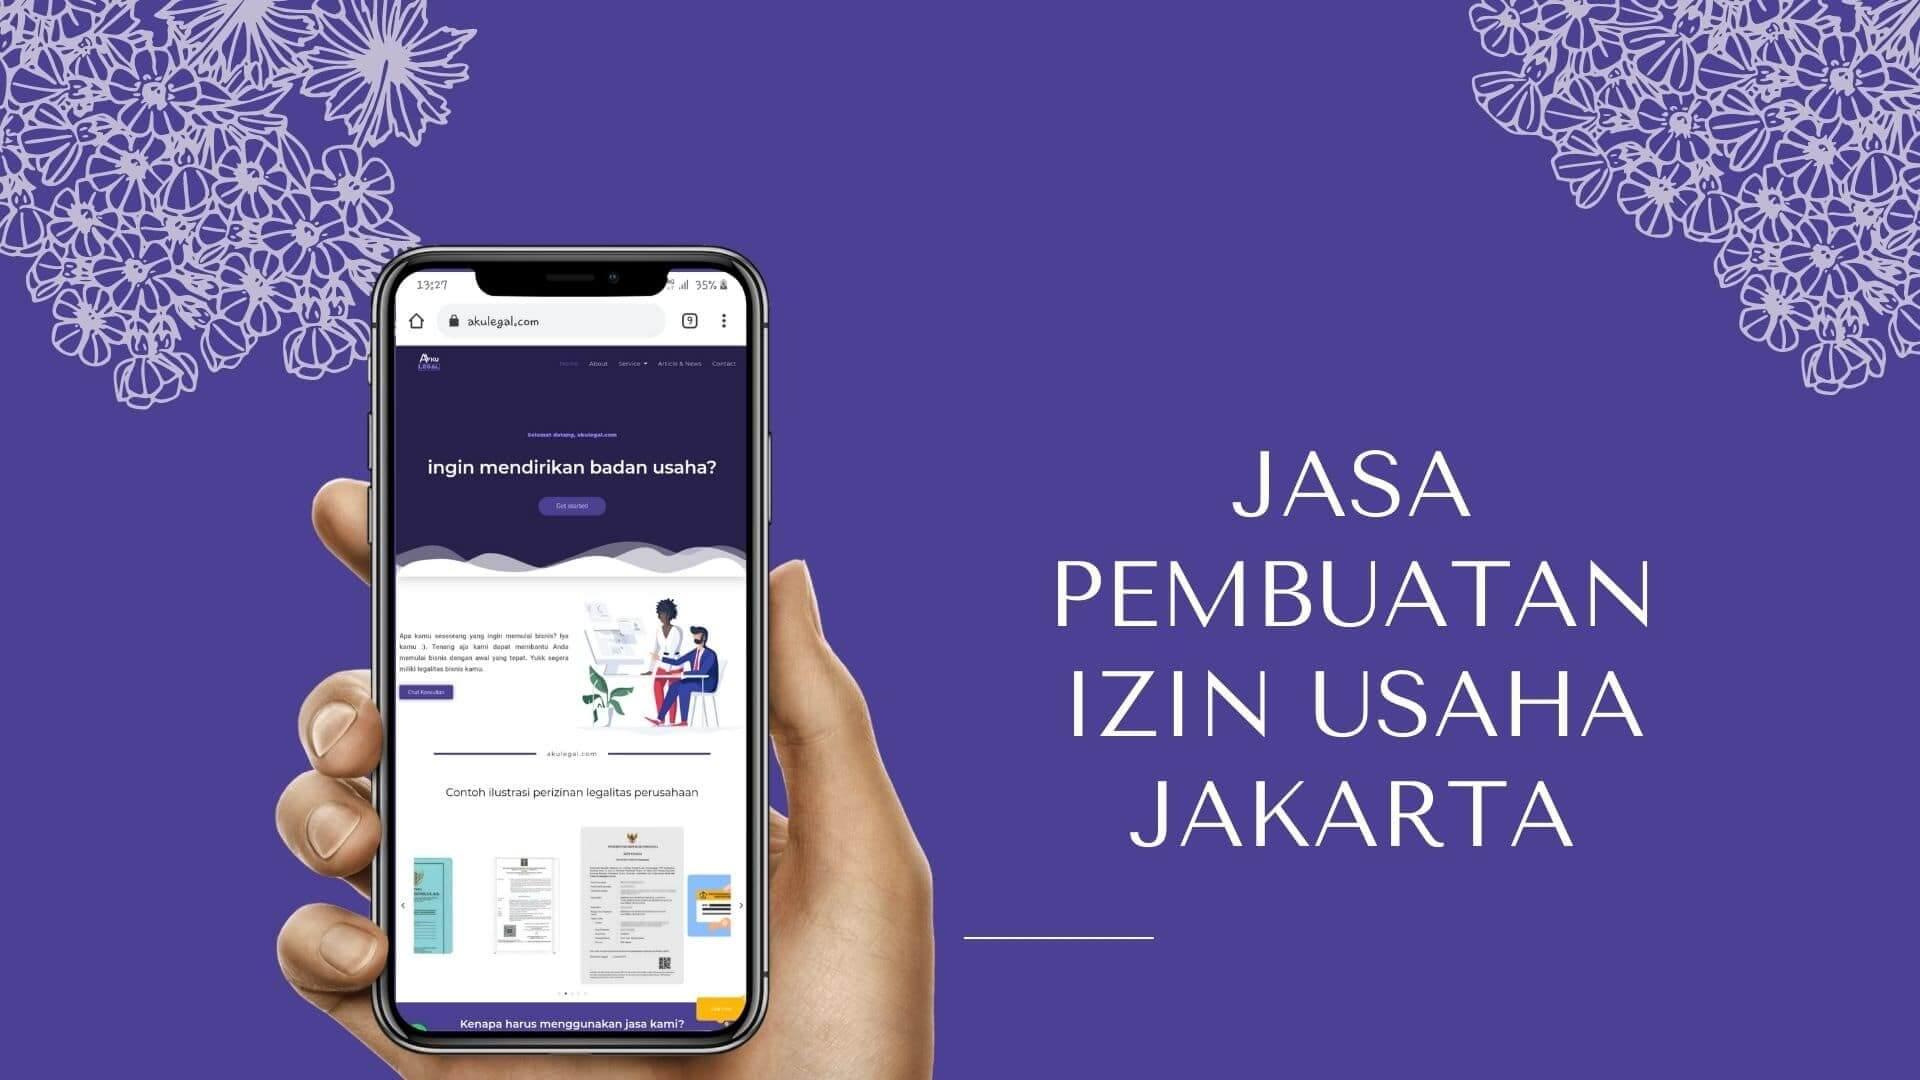 Jasa Pembuatan Izin Usaha Jakarta